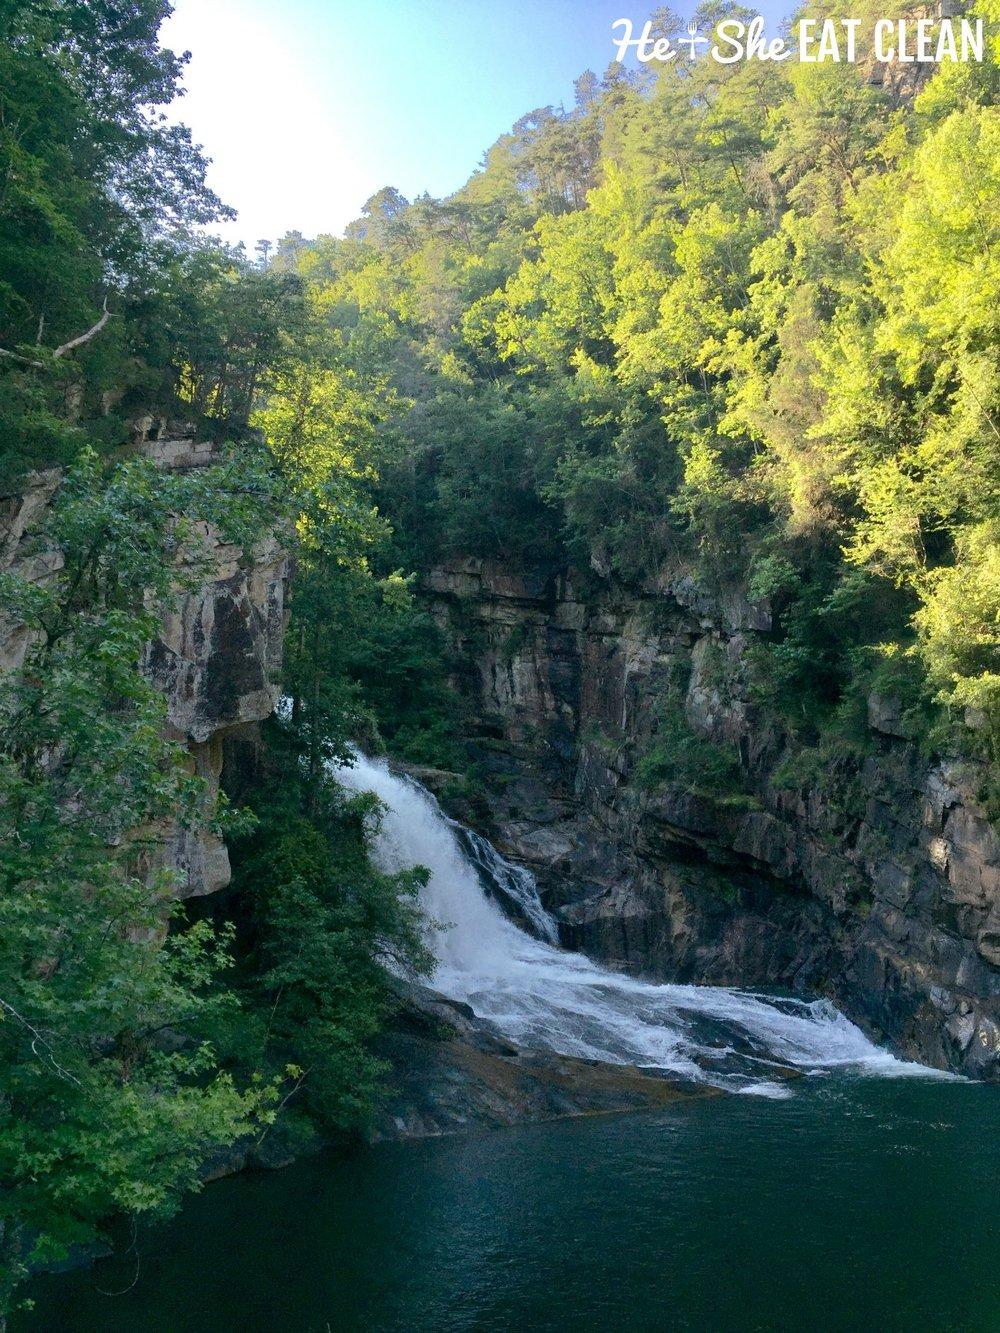 Hiking Tallulah Gorge State Park in Tallulah Falls, GA